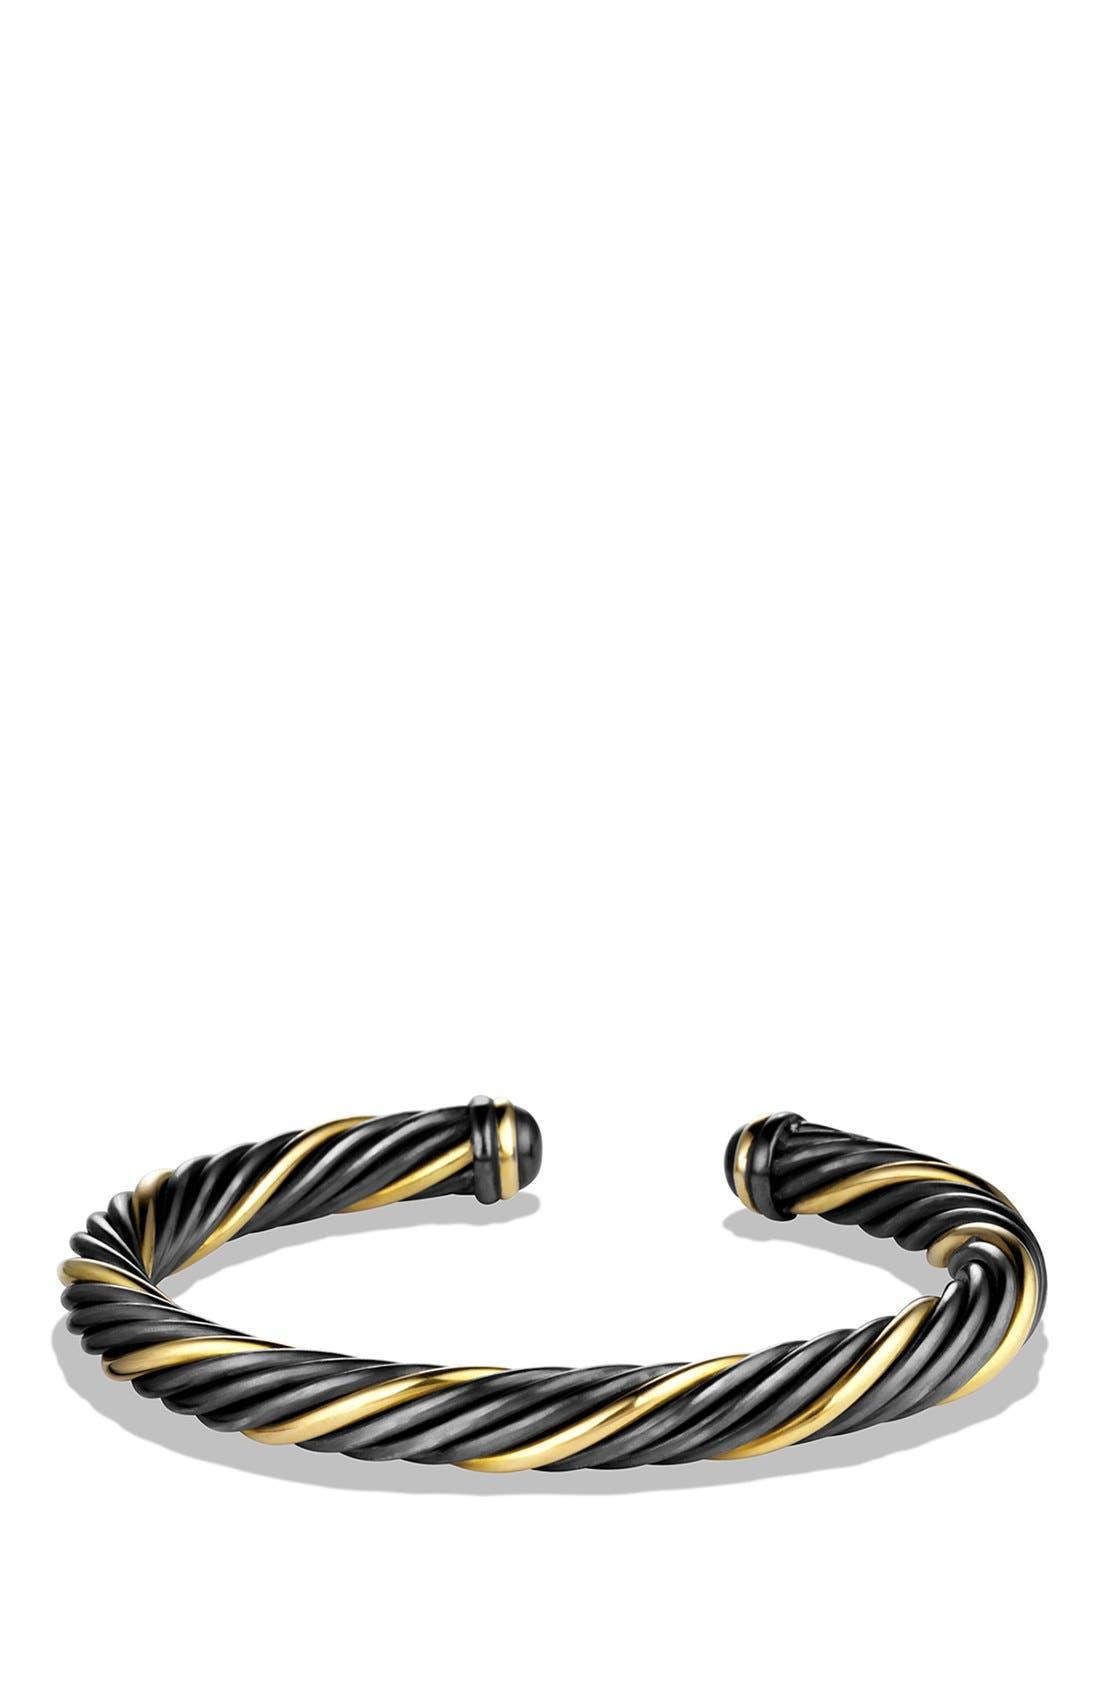 Main Image - David Yurman 'Black and Gold' Cable Bracelet